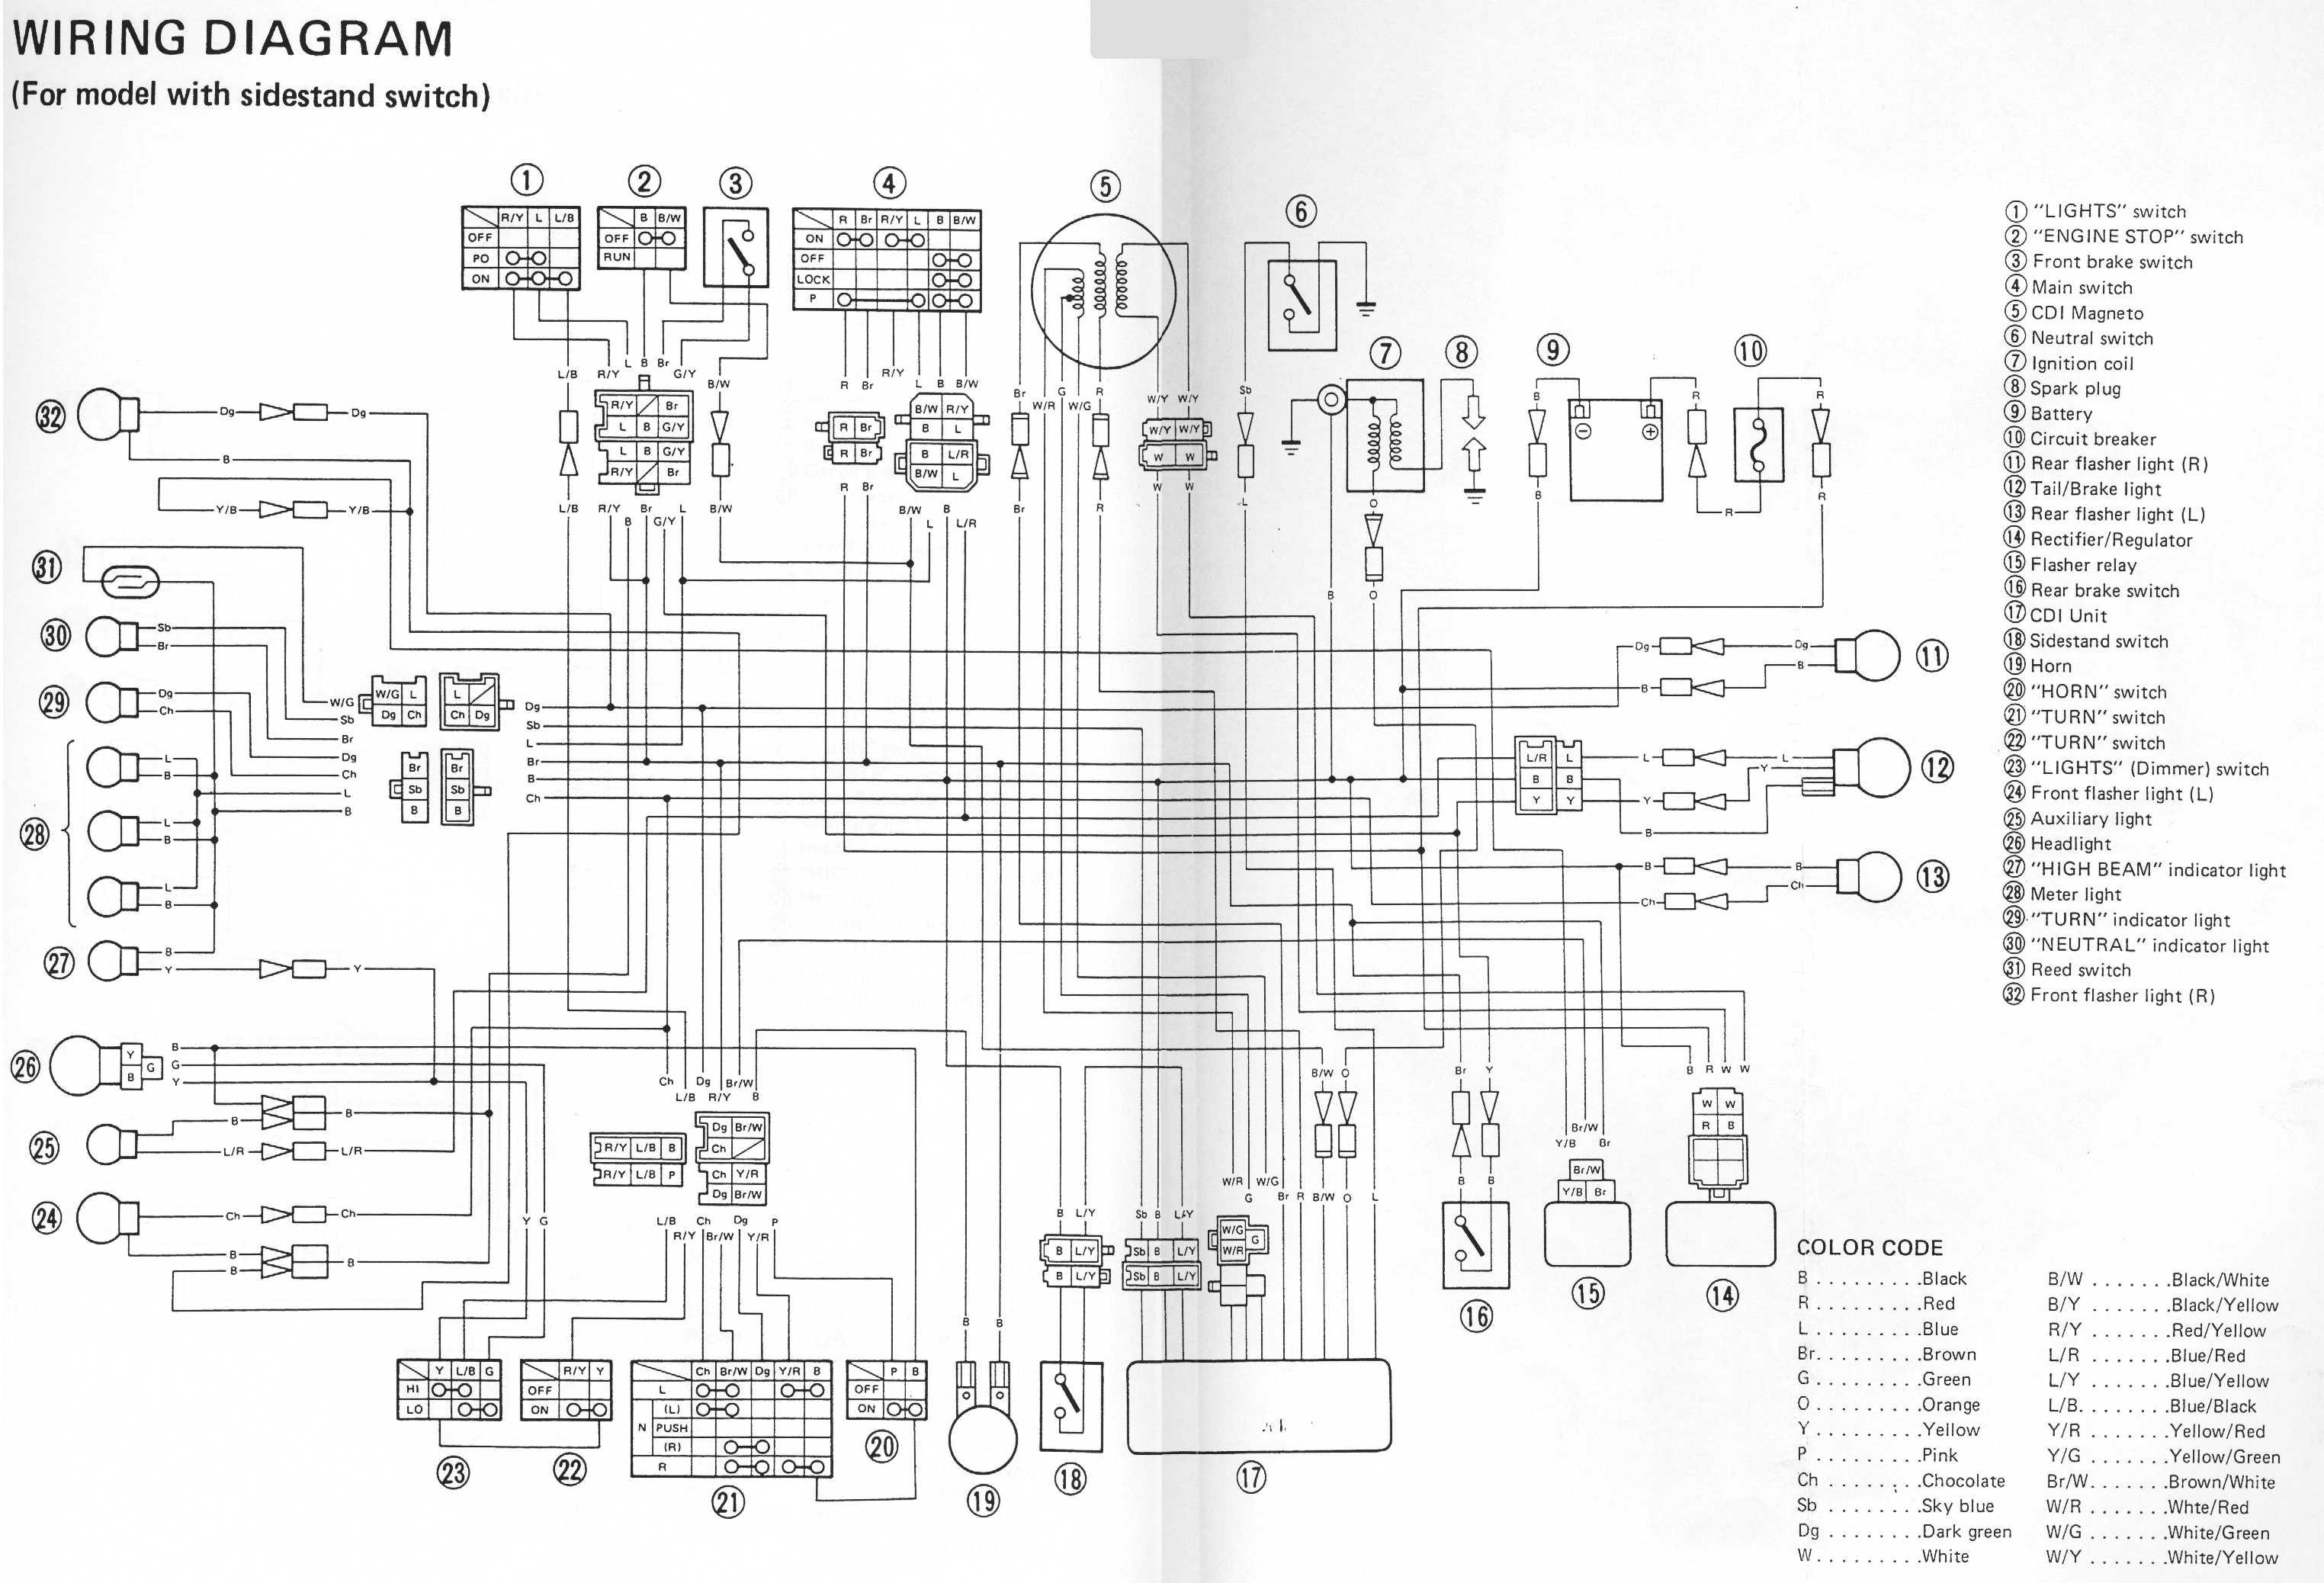 Brilliant 99 Yamaha Outboard Wiring Basic Electronics Wiring Diagram Wiring Cloud Intelaidewilluminateatxorg